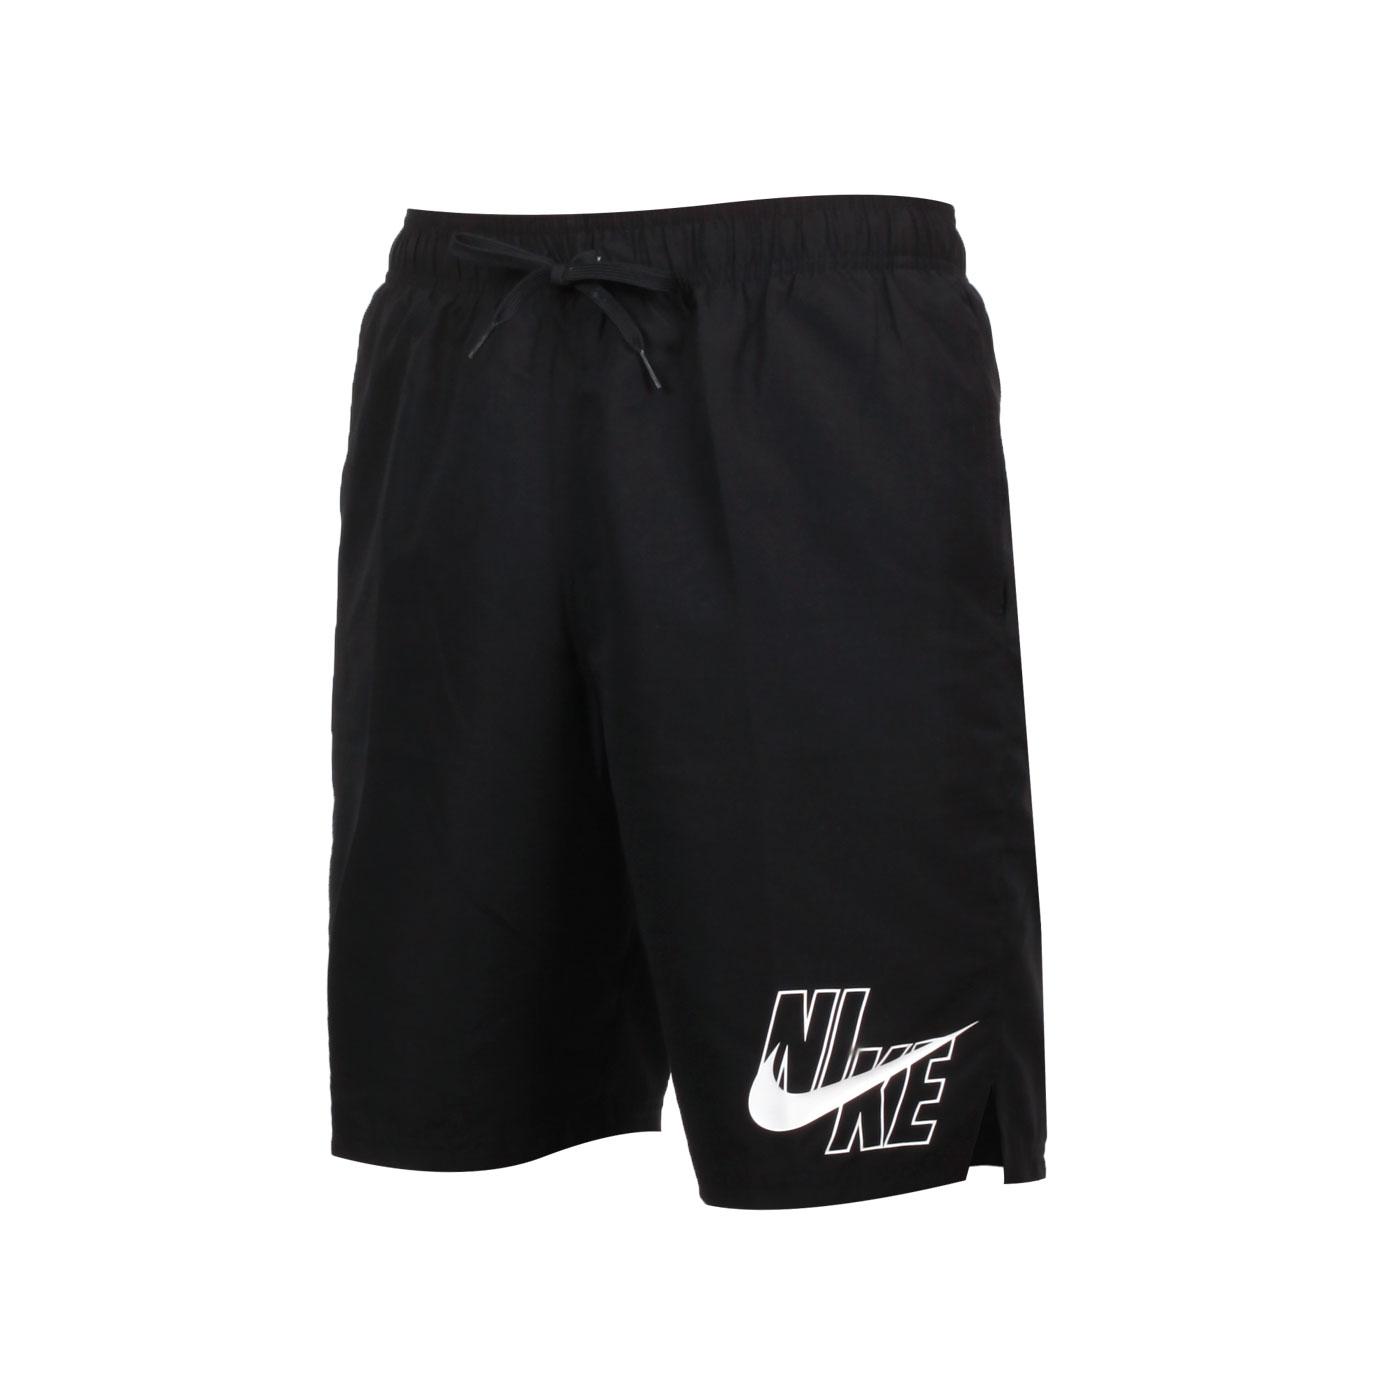 NIKE SWIM 男款九吋海灘褲 NESSA565-001 - 黑白